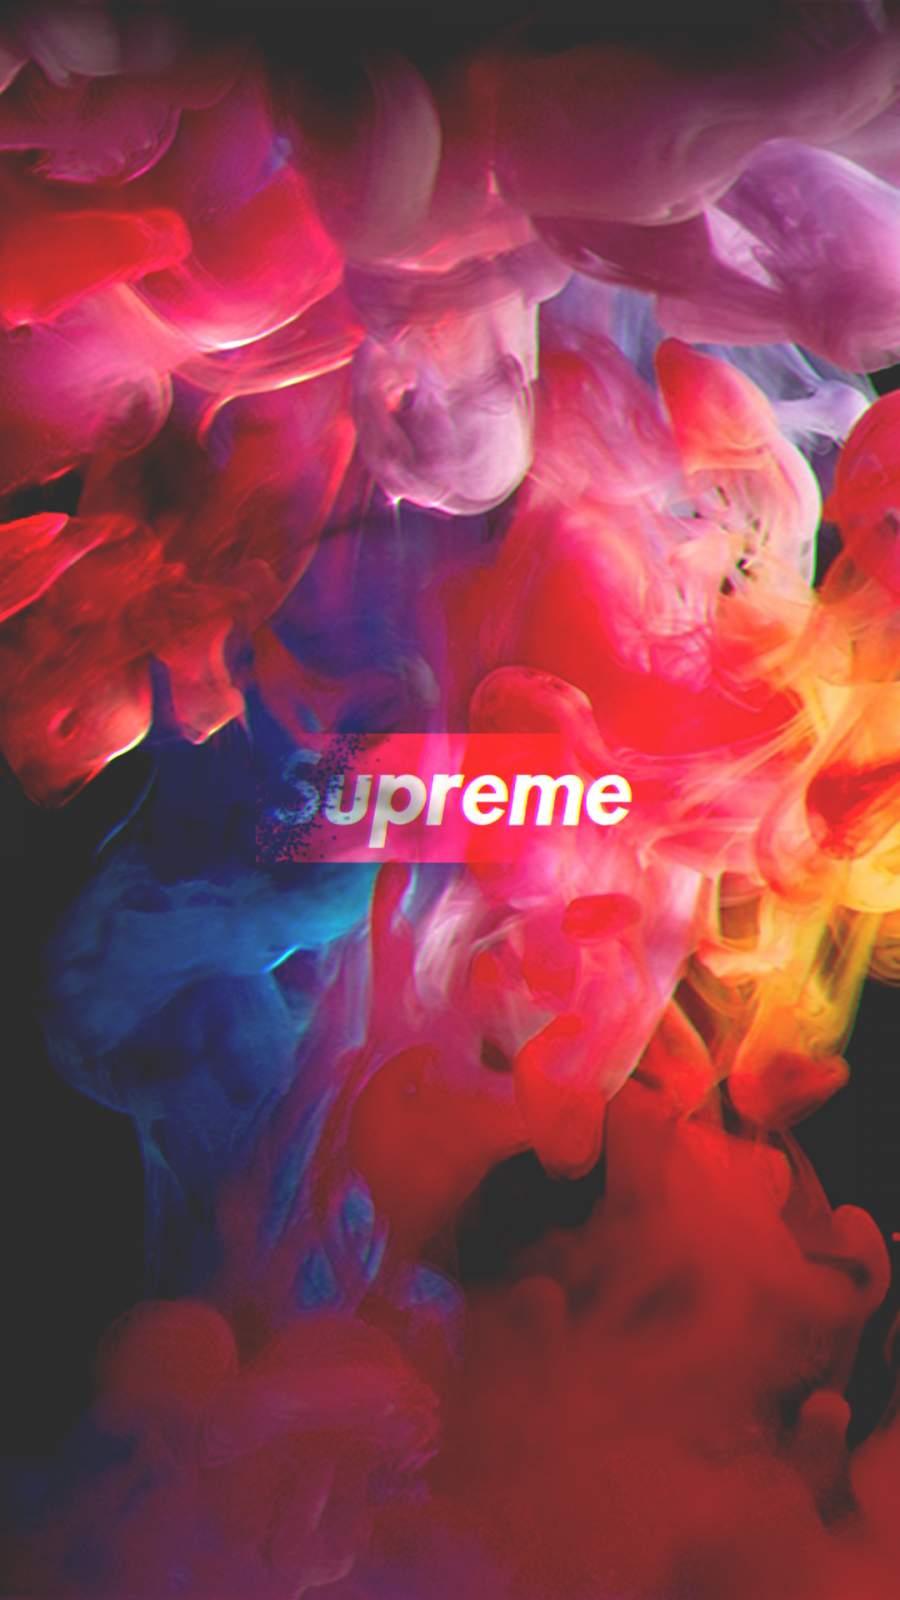 Supreme HD iPhone Wallpaper